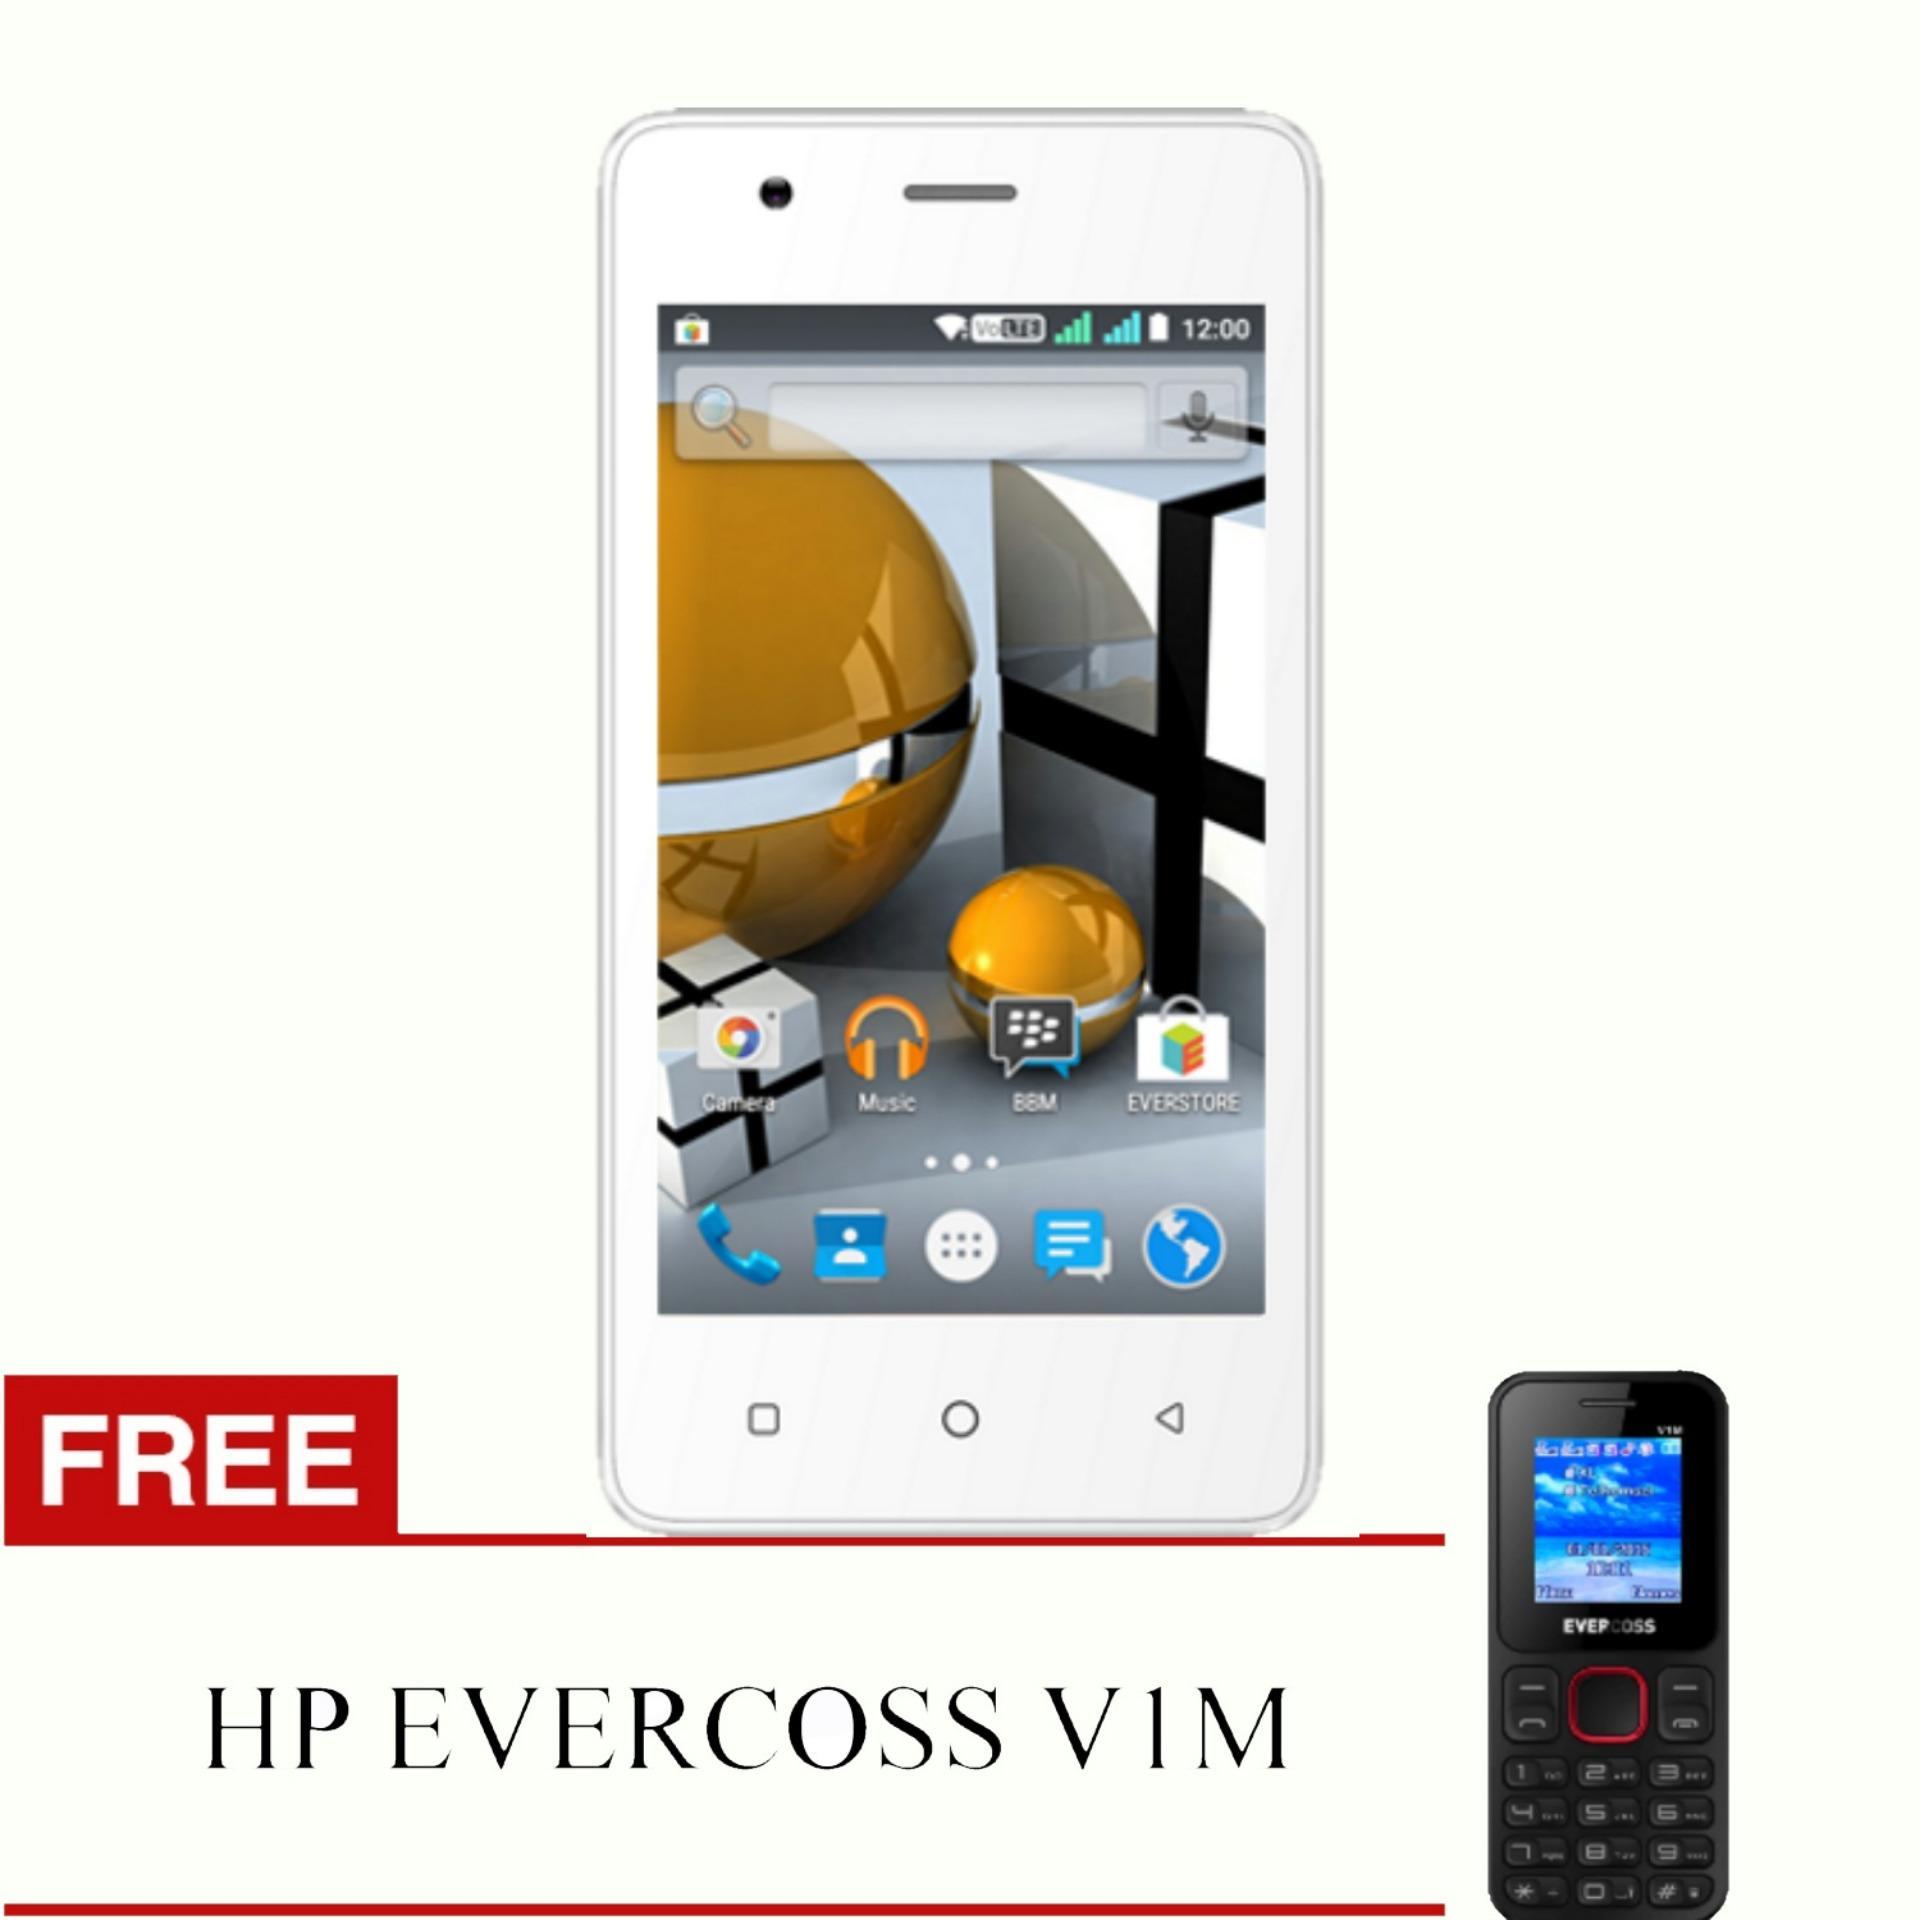 Jaringan LTE Evercoss Winner T M40 koneksi 4G TERMURAH SE INDONESIA RAM 1GB Free HP